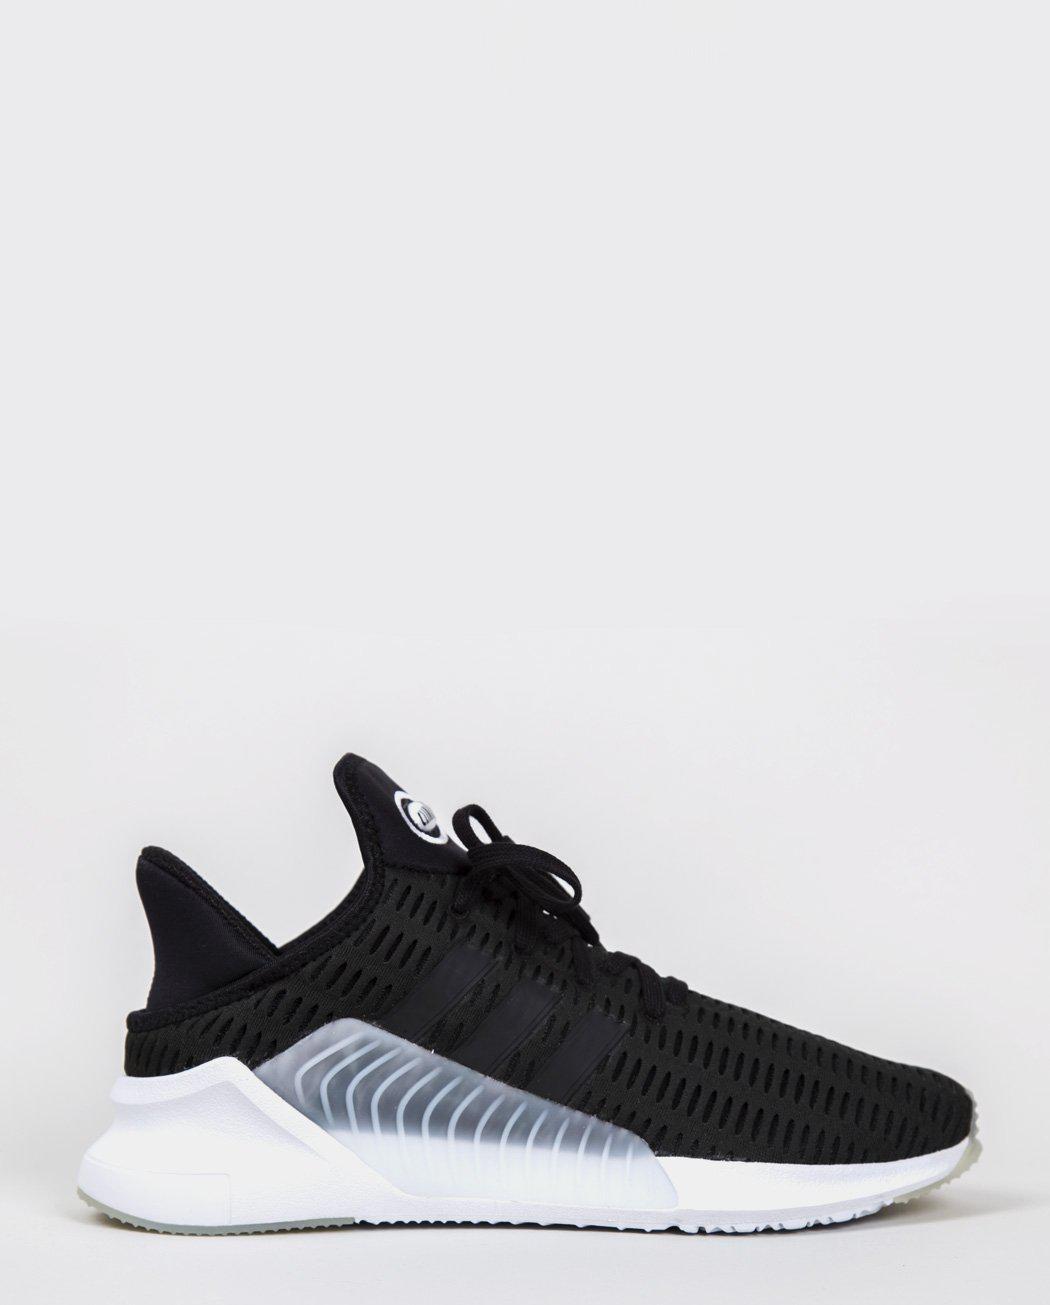 buy popular 3bb56 0a611 adidas Originals Adidas Climacool 2 (bz0249) in Black for Me